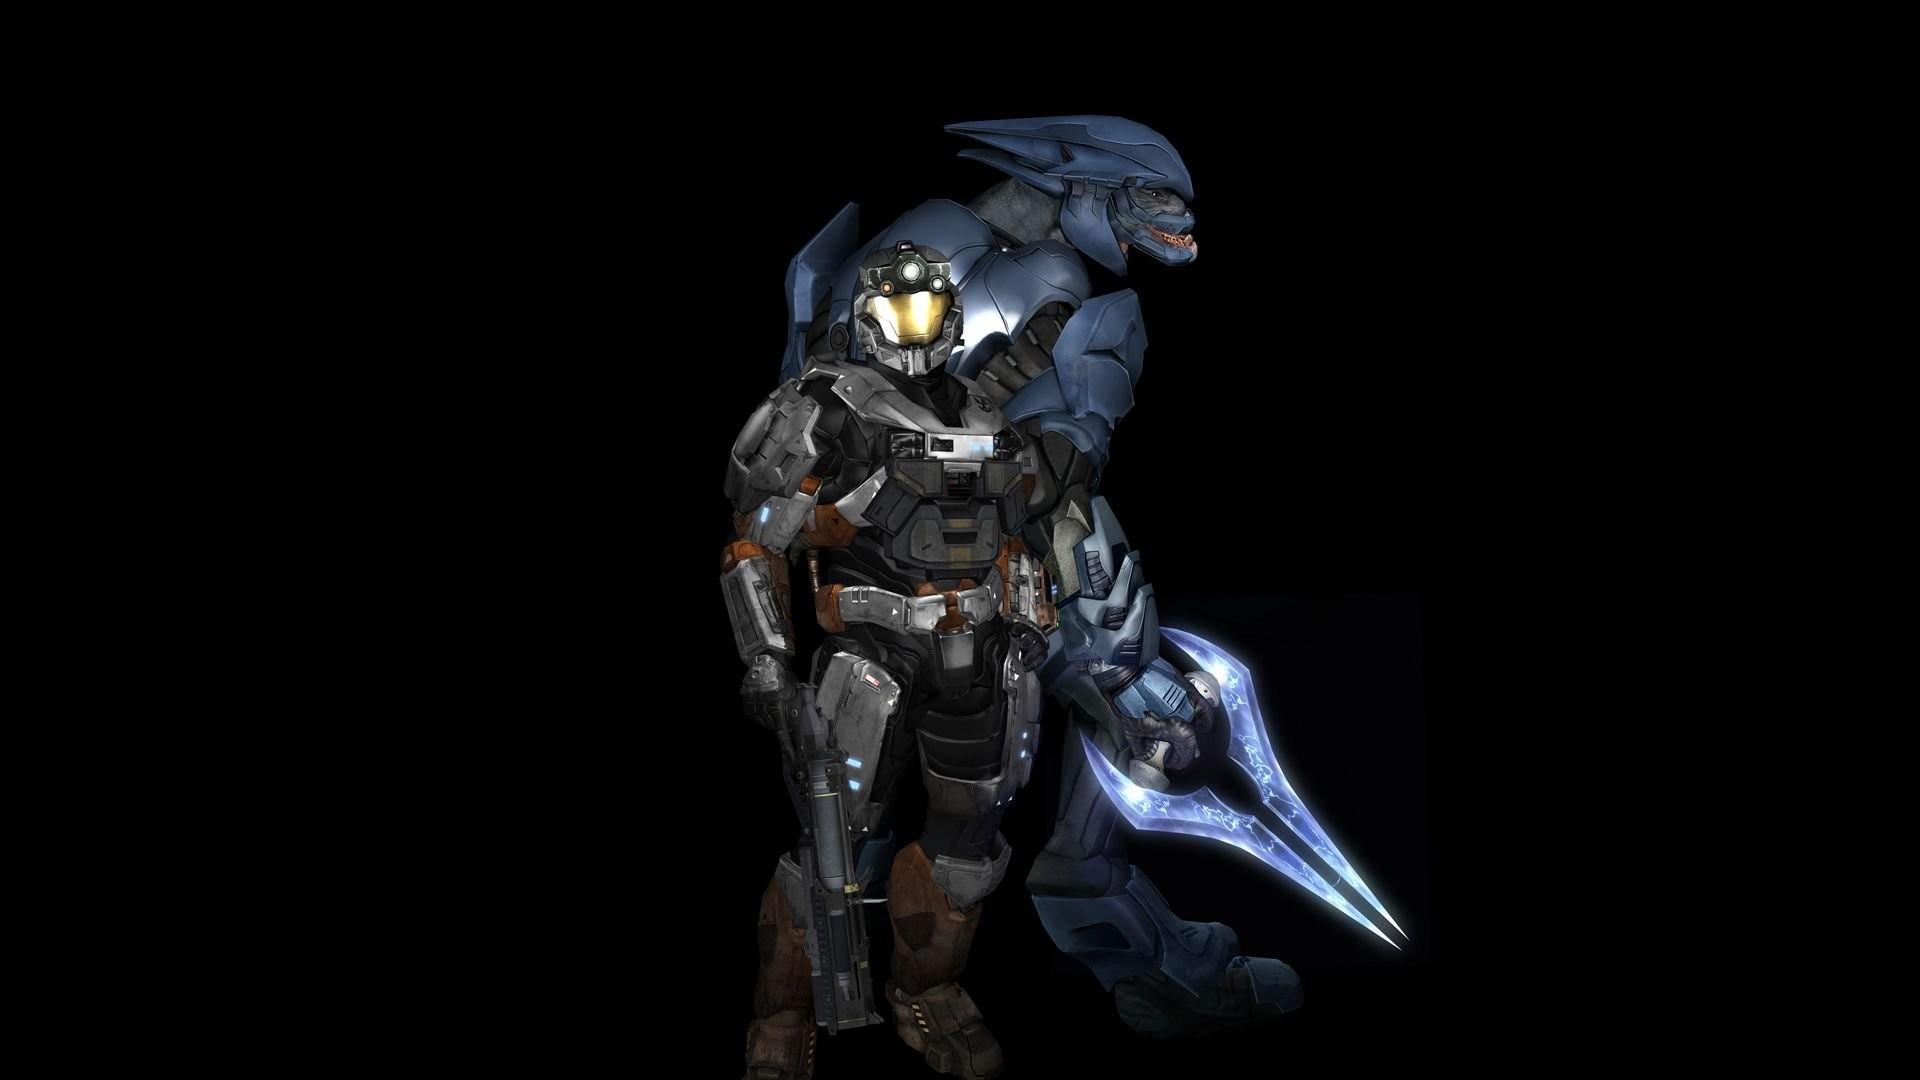 Halo Reach Elite 608189 …